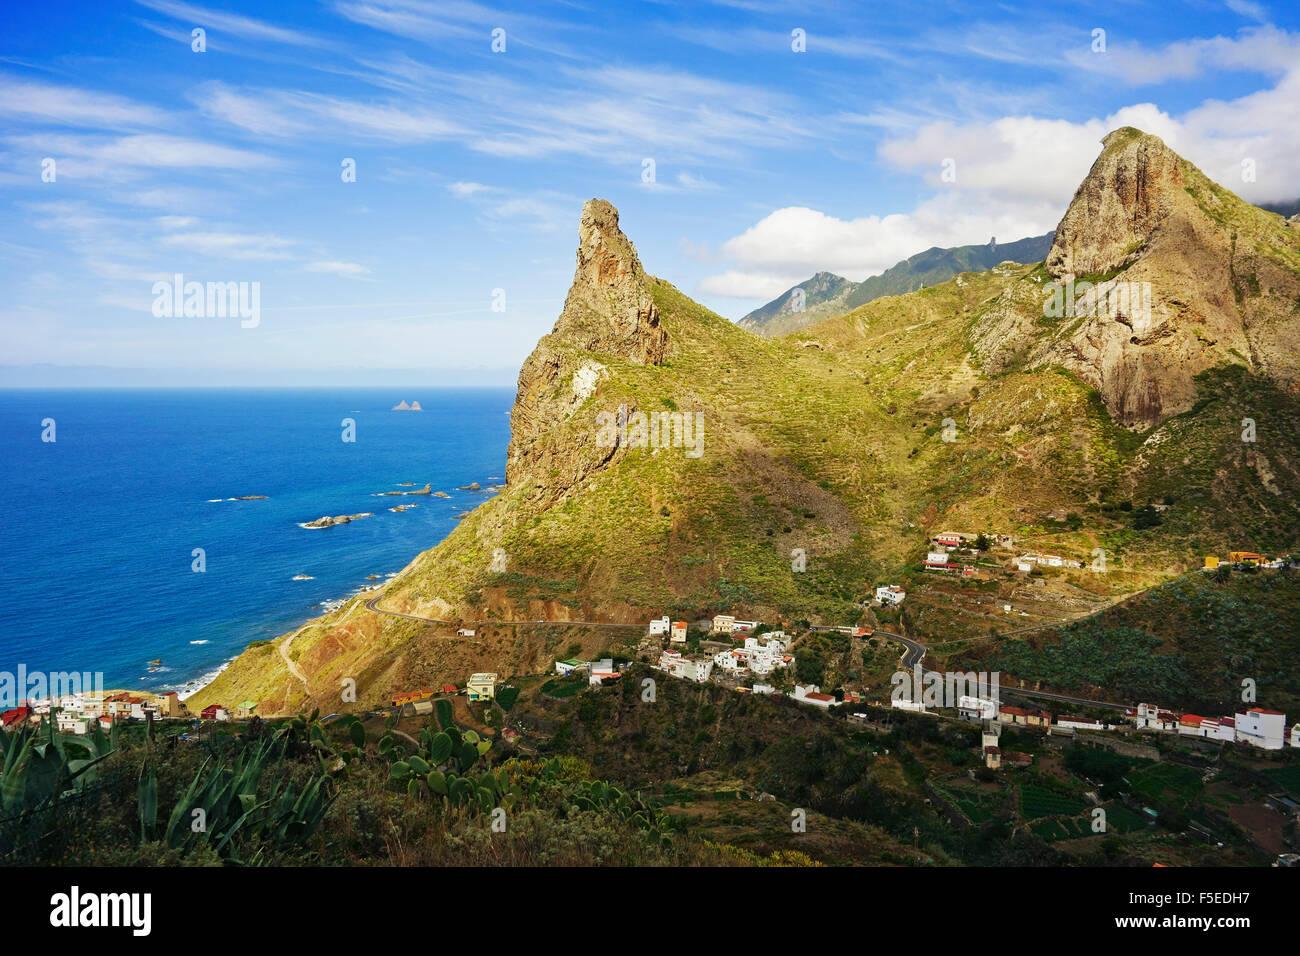 Taganana Dorf, Anaga-Gebirge, Teneriffa, Kanarische Inseln, Spanien, Atlantik, Europa Stockbild